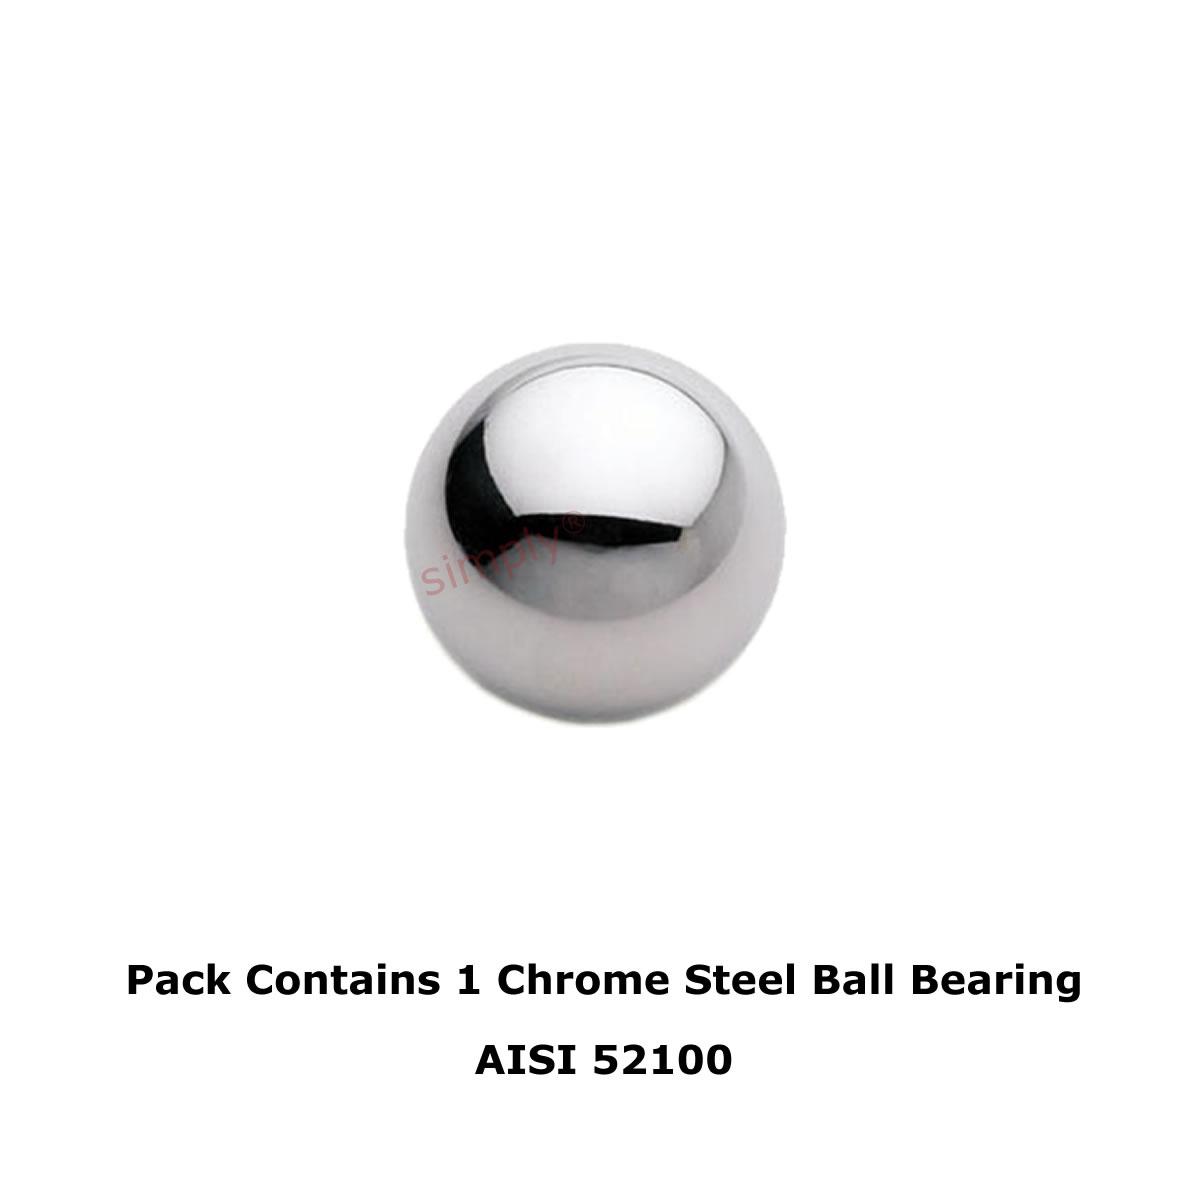 1.5mm Chrome Steel Bearing Balls Precision Grade 10 Hardened AISI52100